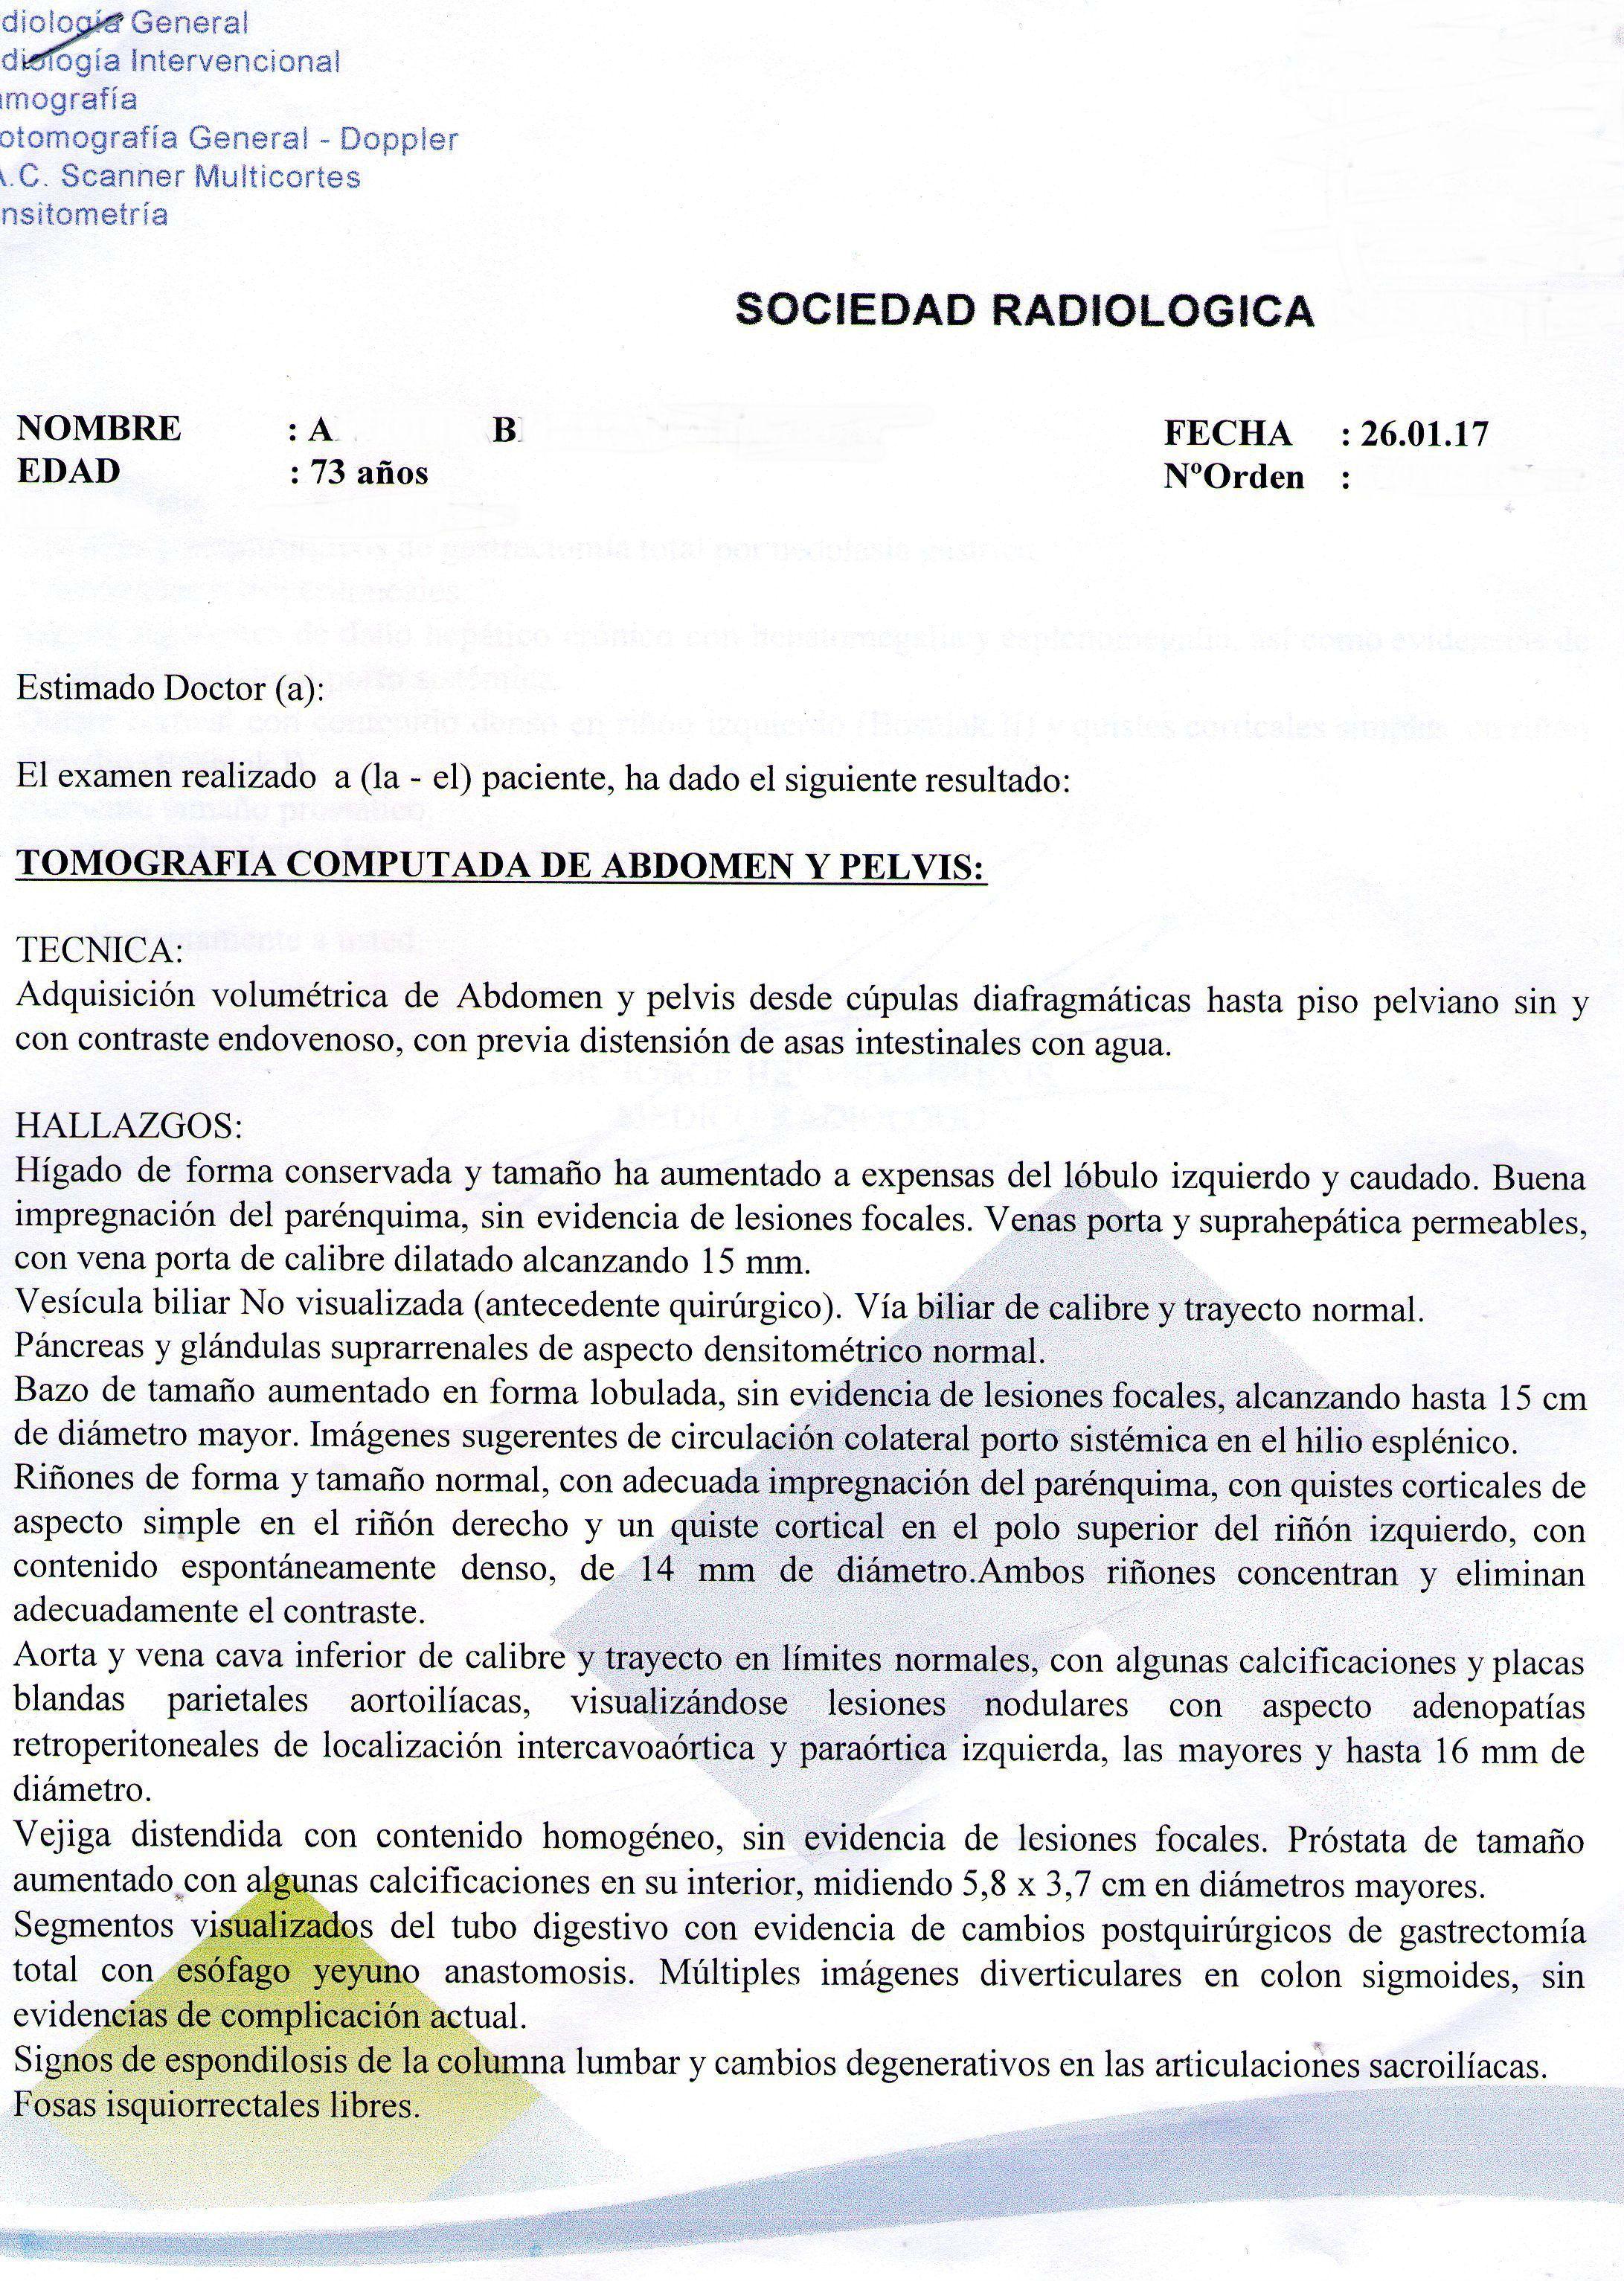 LifEscozul® - A.B. 3 - Cáncer Gástrico Intestinal